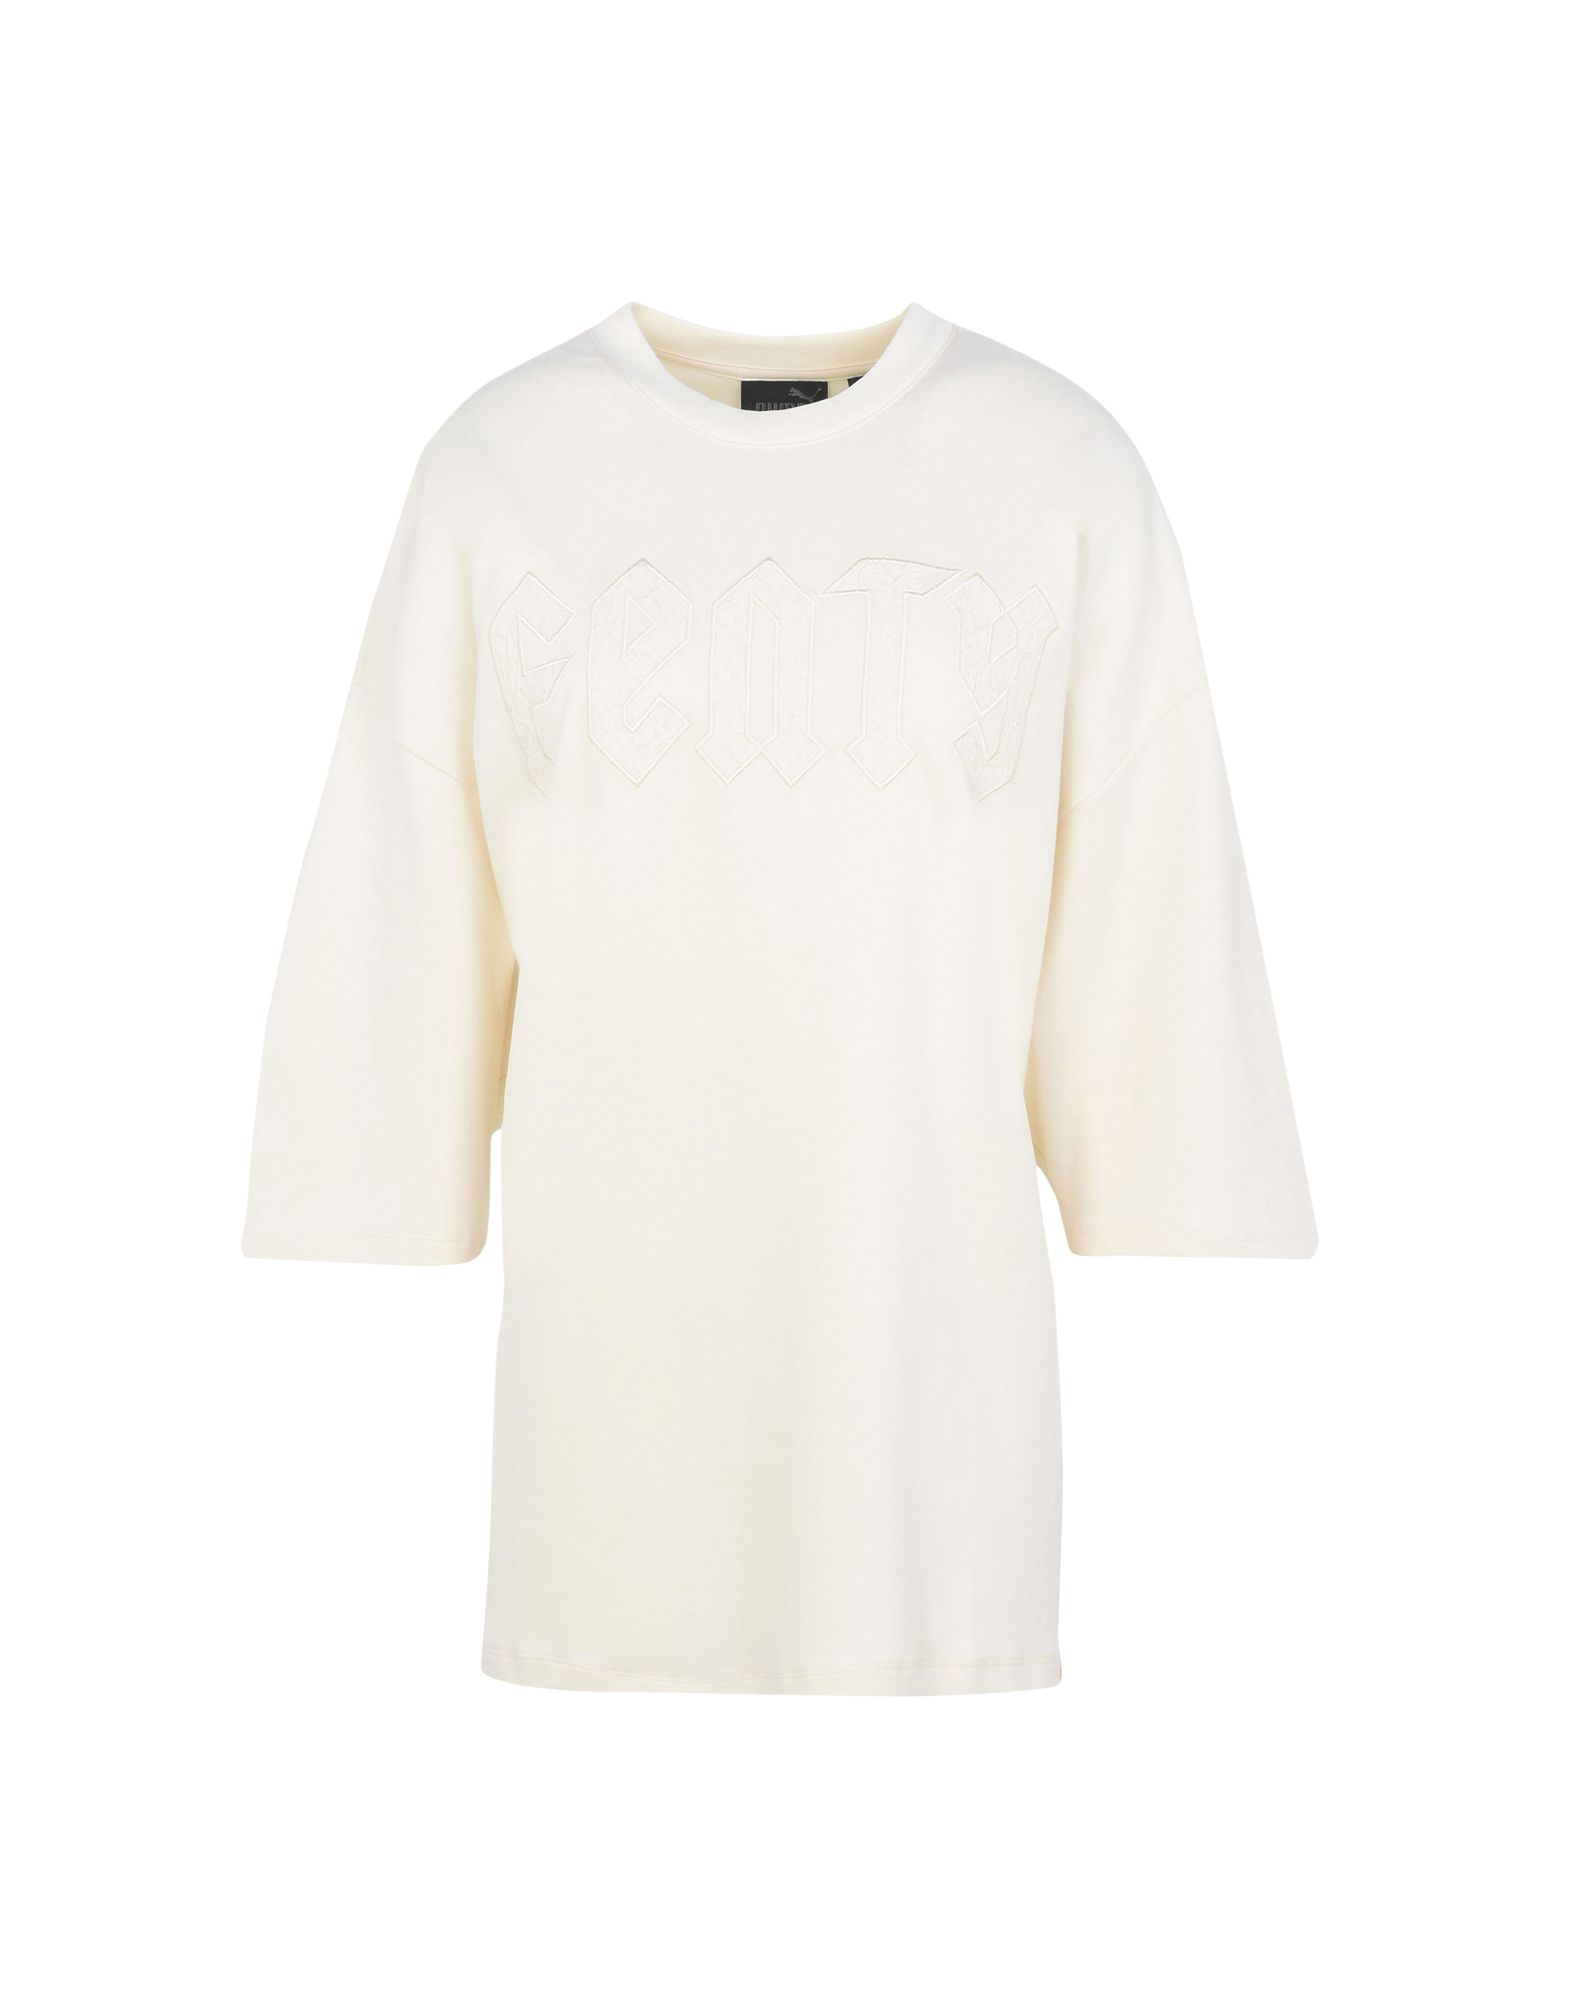 best website 55d81 e9a49 FENTY PUMA by RIHANNA T-shirt - T-Shirts and Tops | YOOX.COM